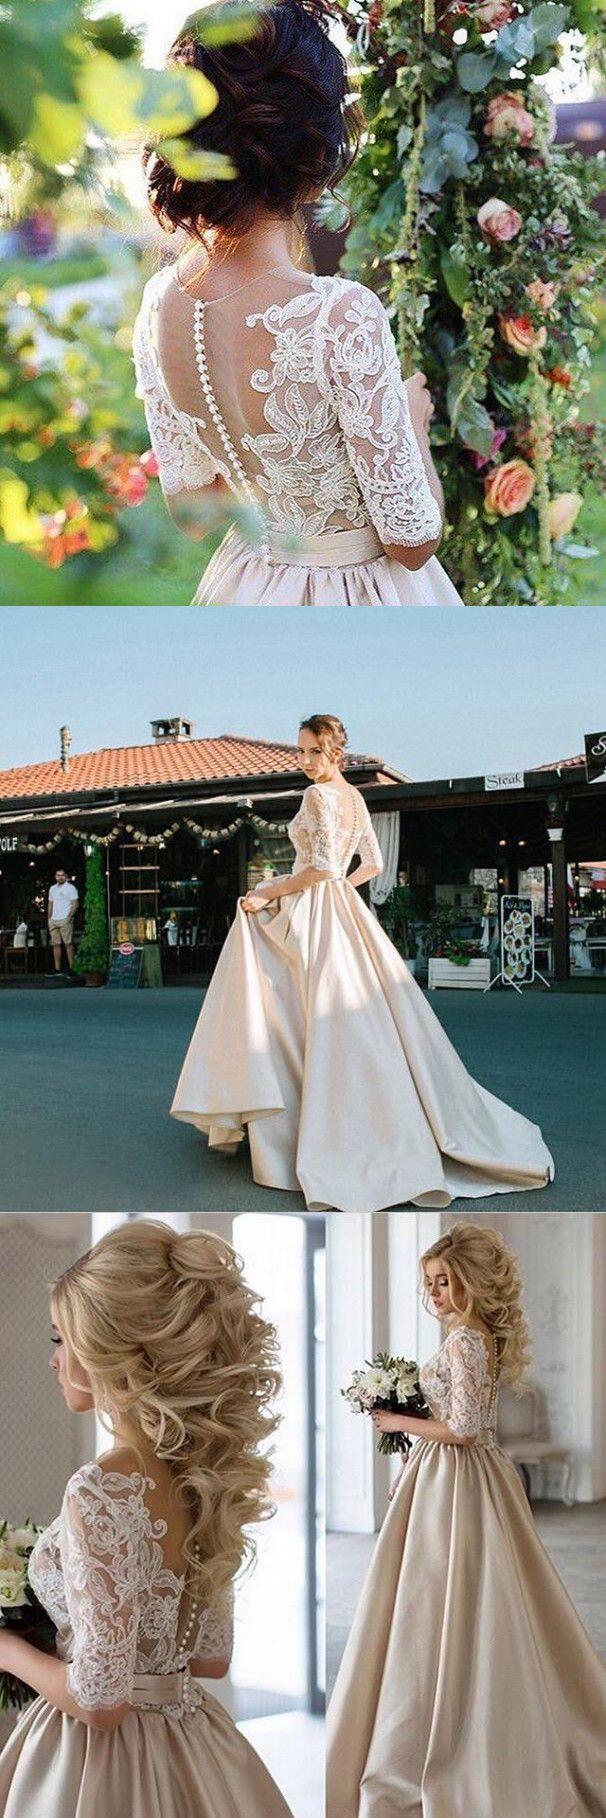 2017 half sleeves white lace wedding dress, modest wedding dress,2017 prom dress, long prom dress, half sleeves prom dress, champagne prom dress with white lace